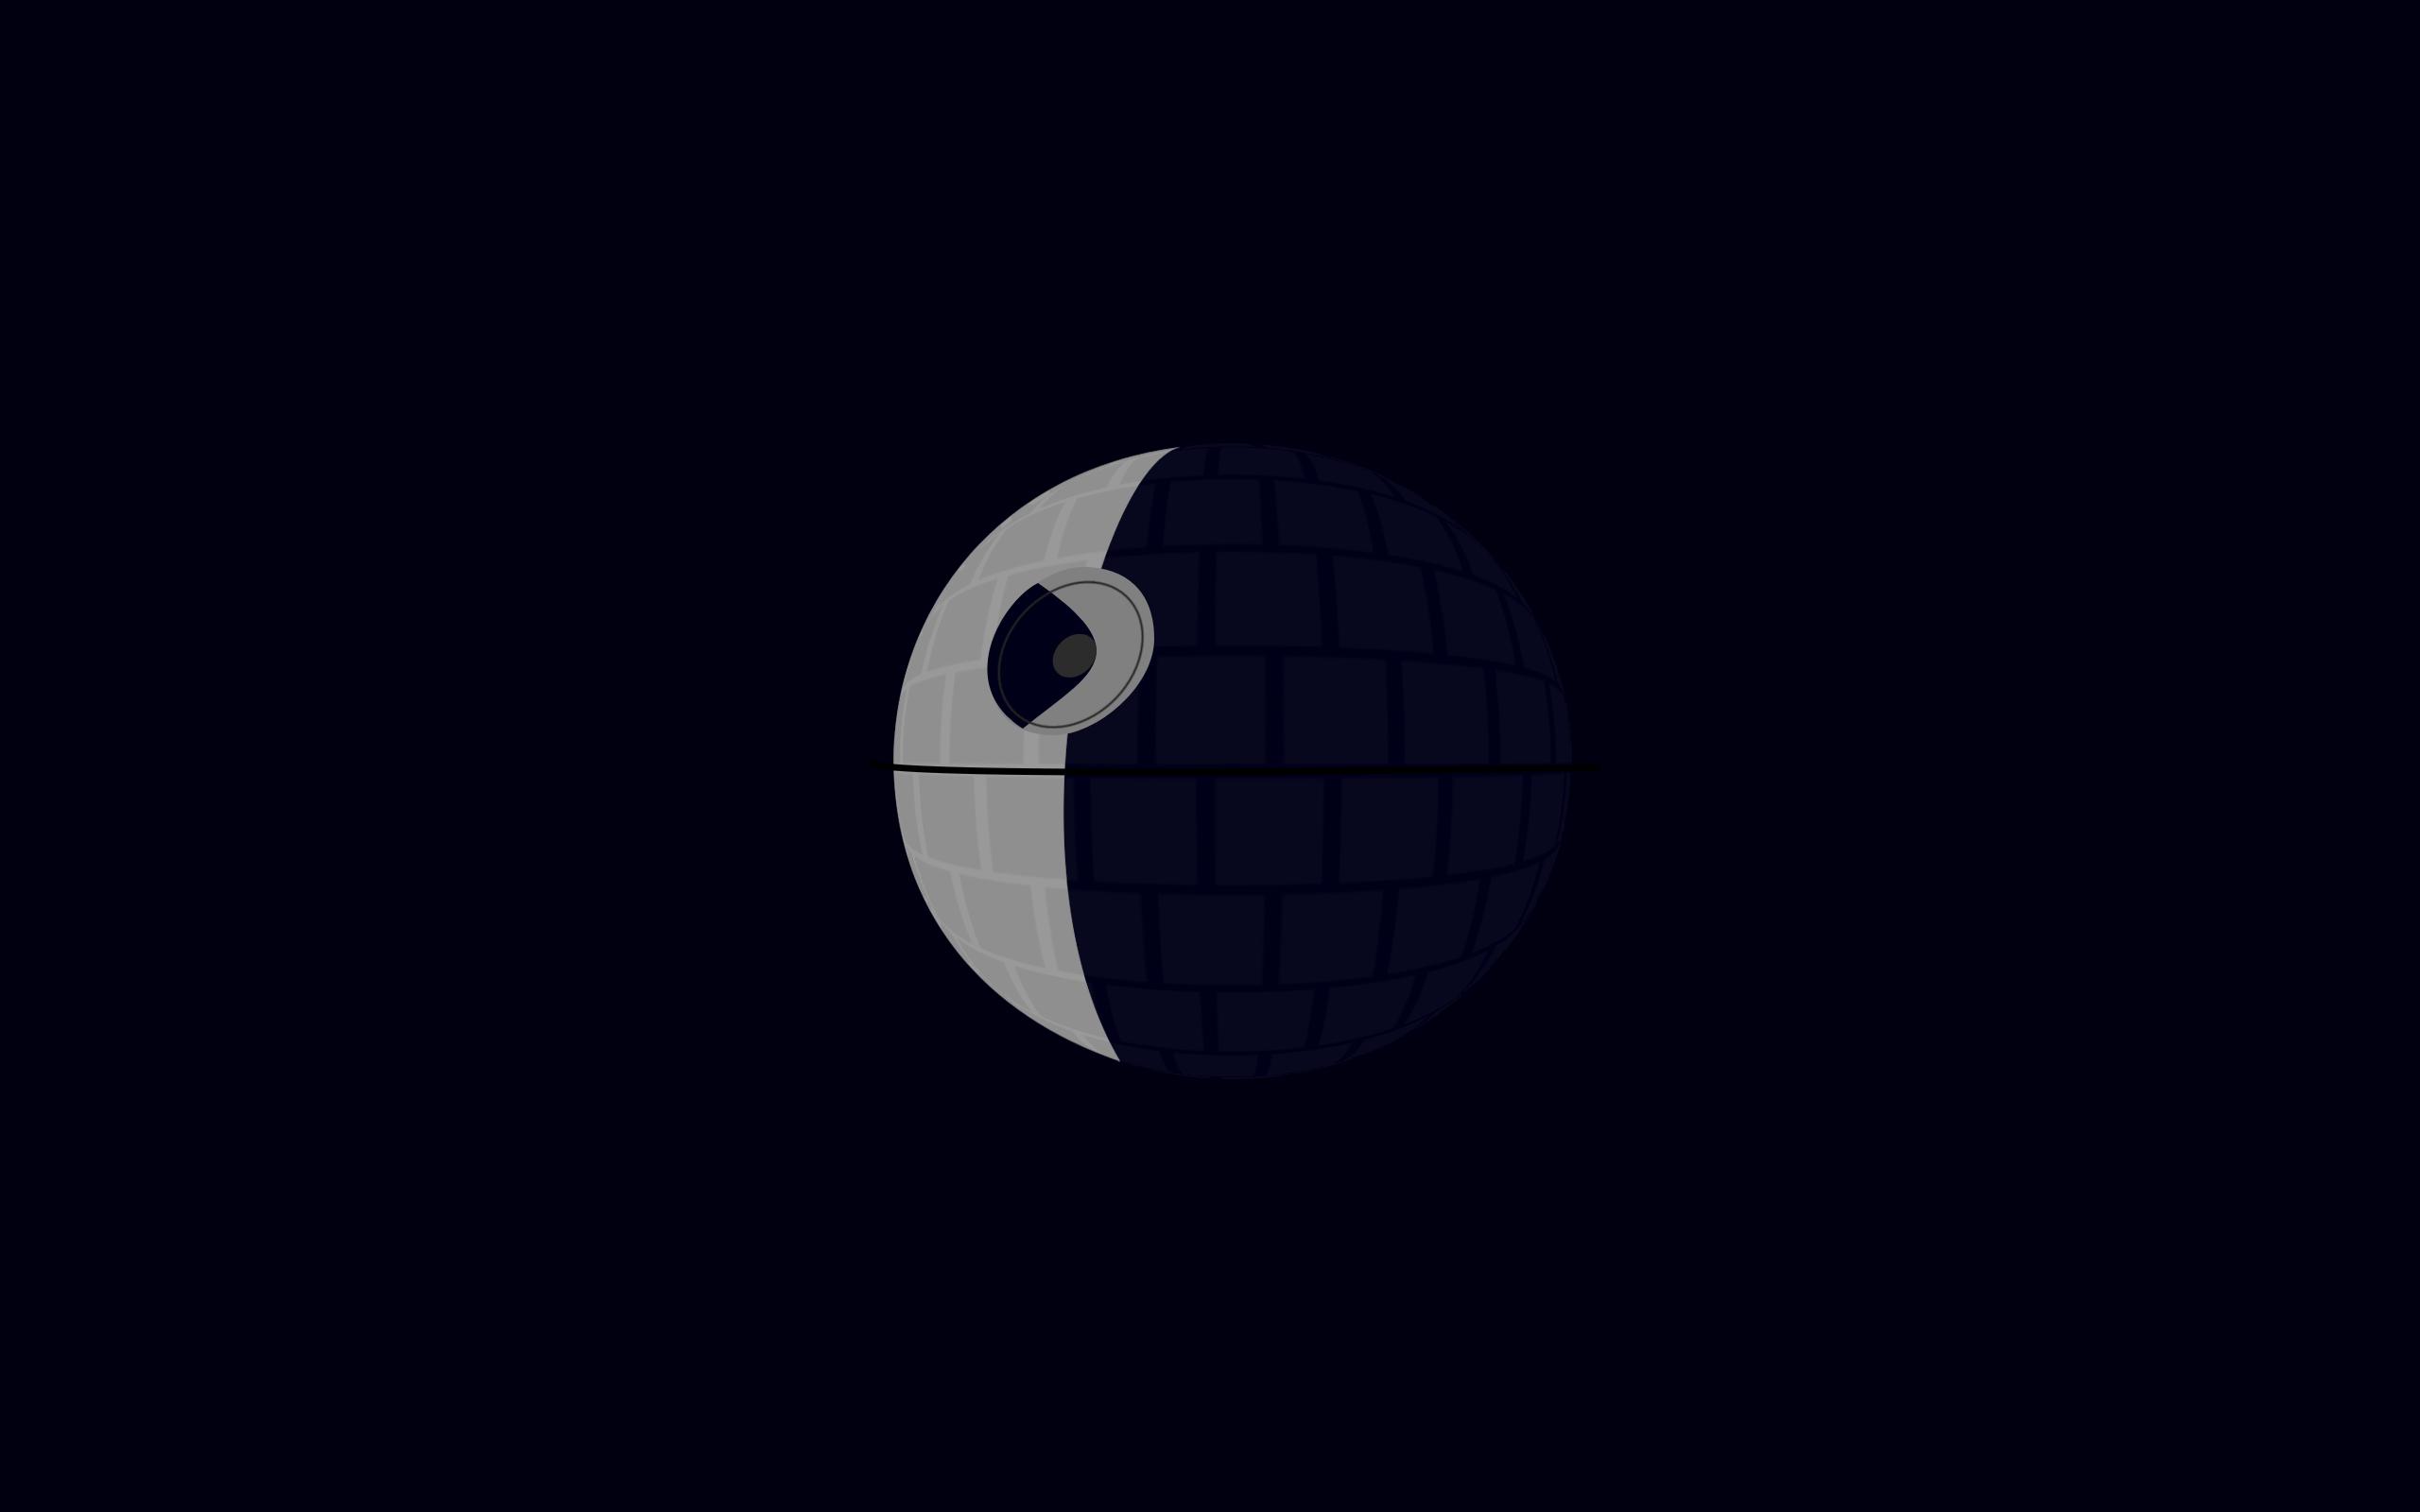 Star Wars Death Star Wallpapers Top Free Star Wars Death Star Backgrounds Wallpaperaccess